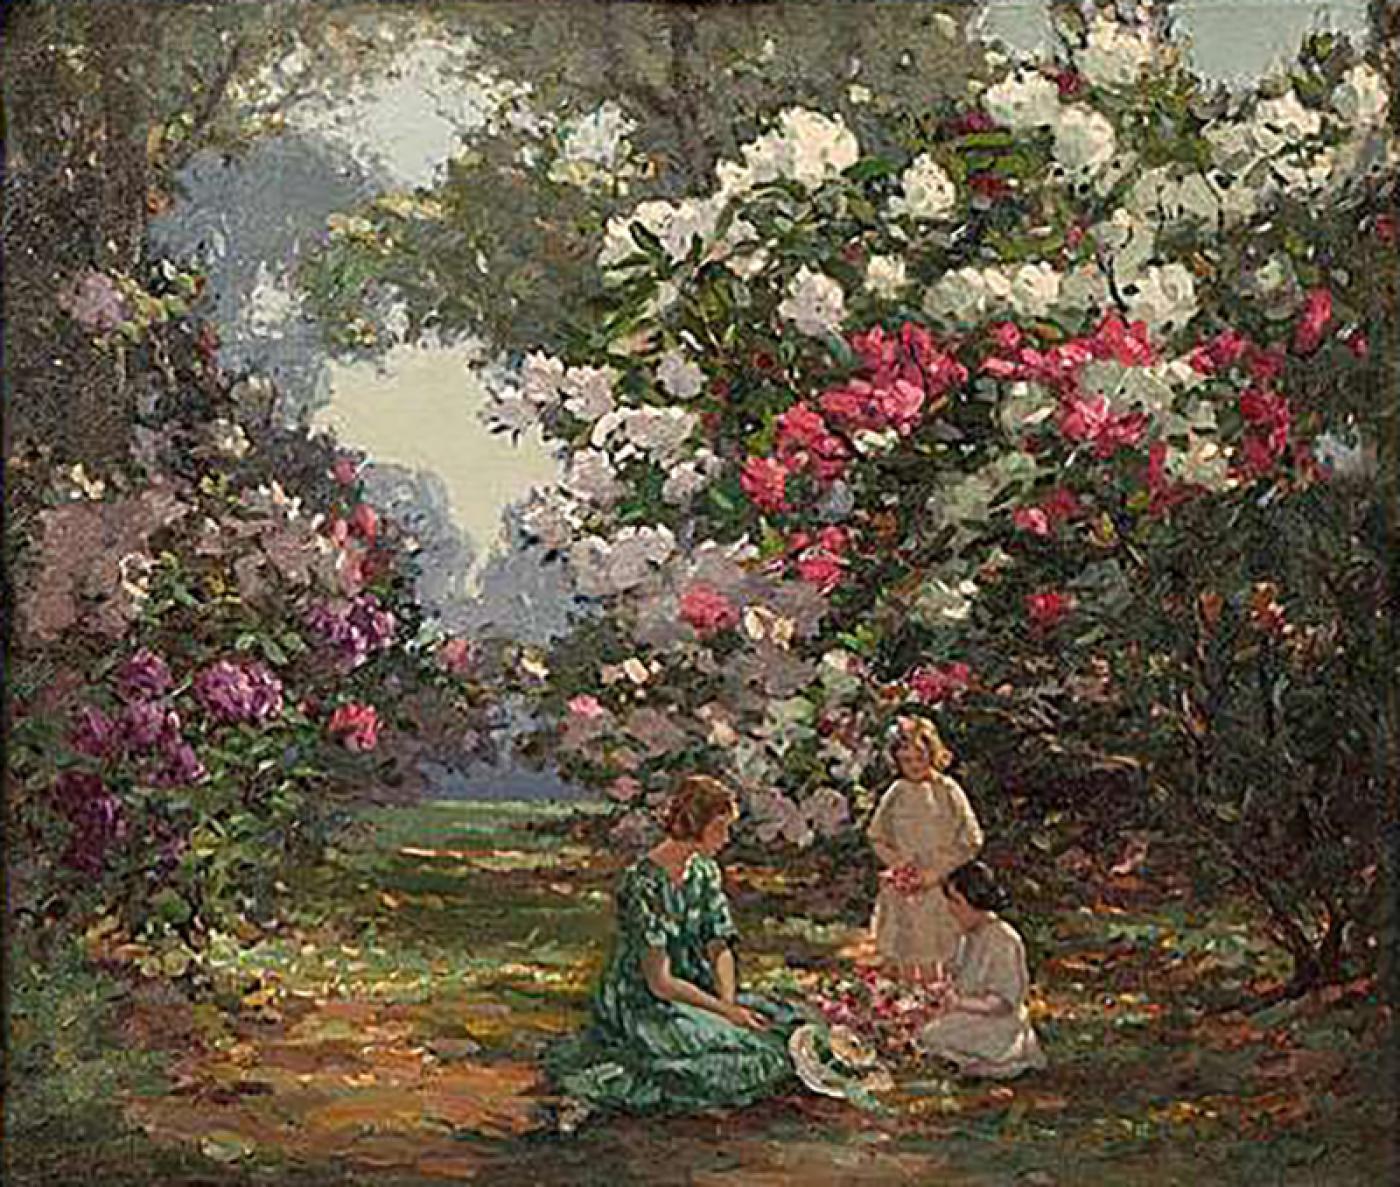 Augustus W. Enness - 20th Century English Painting of \'Kew Gardens ...